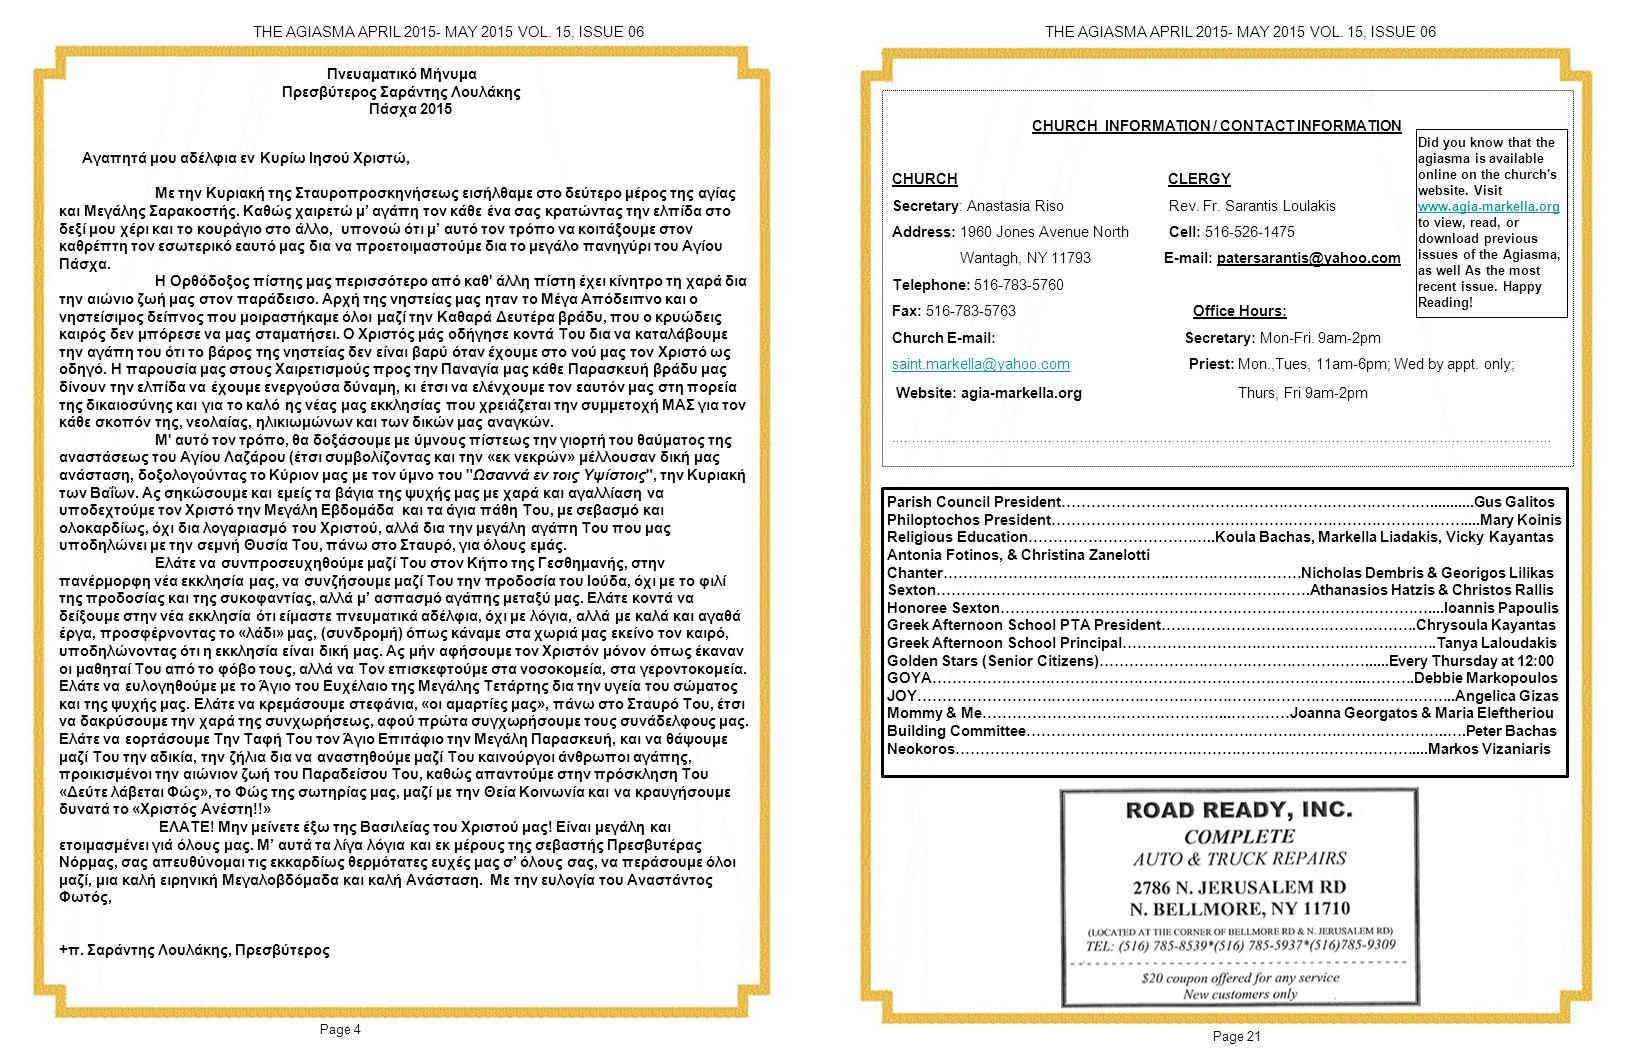 Page 21 Page 4 THE AGIASMA APRIL 2015- MAY 2015 VOL.